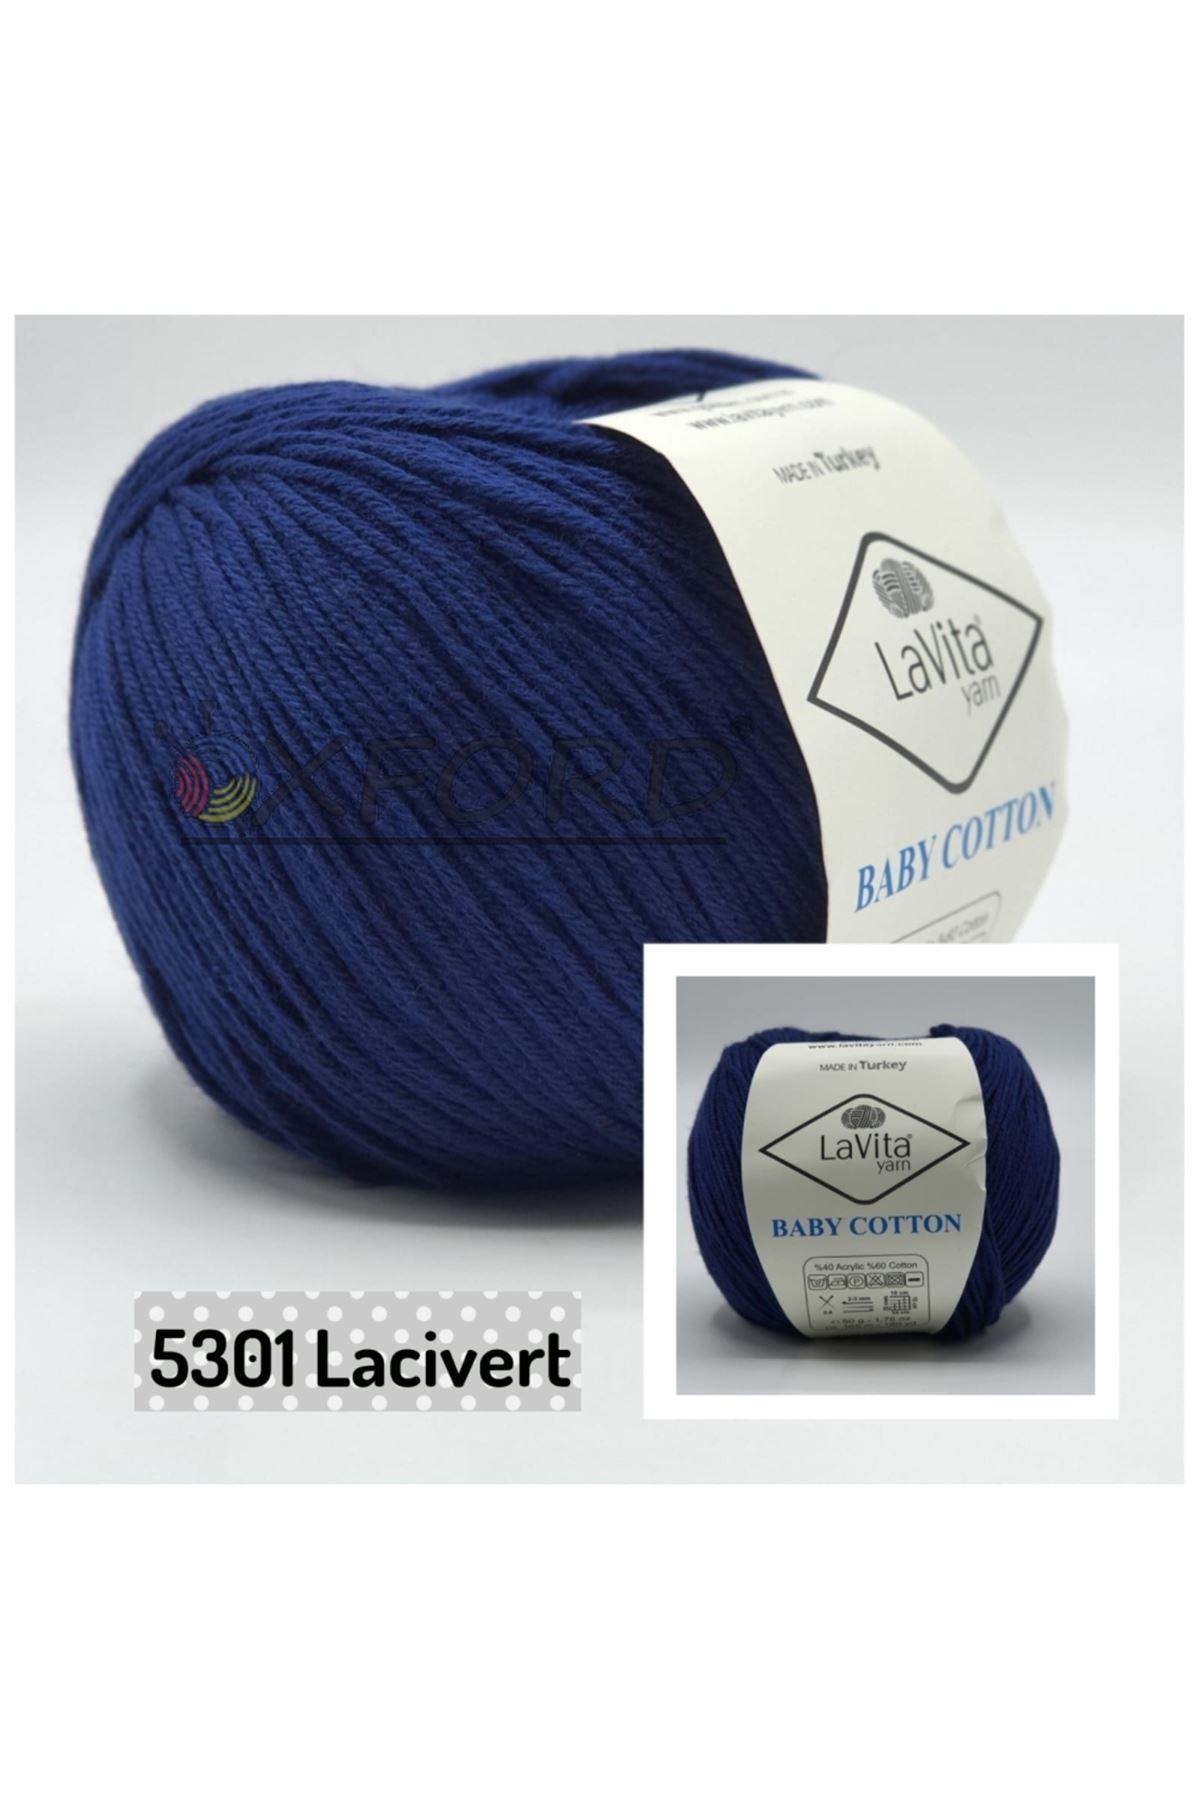 Lavita Baby Cotton 5301 Lacivert